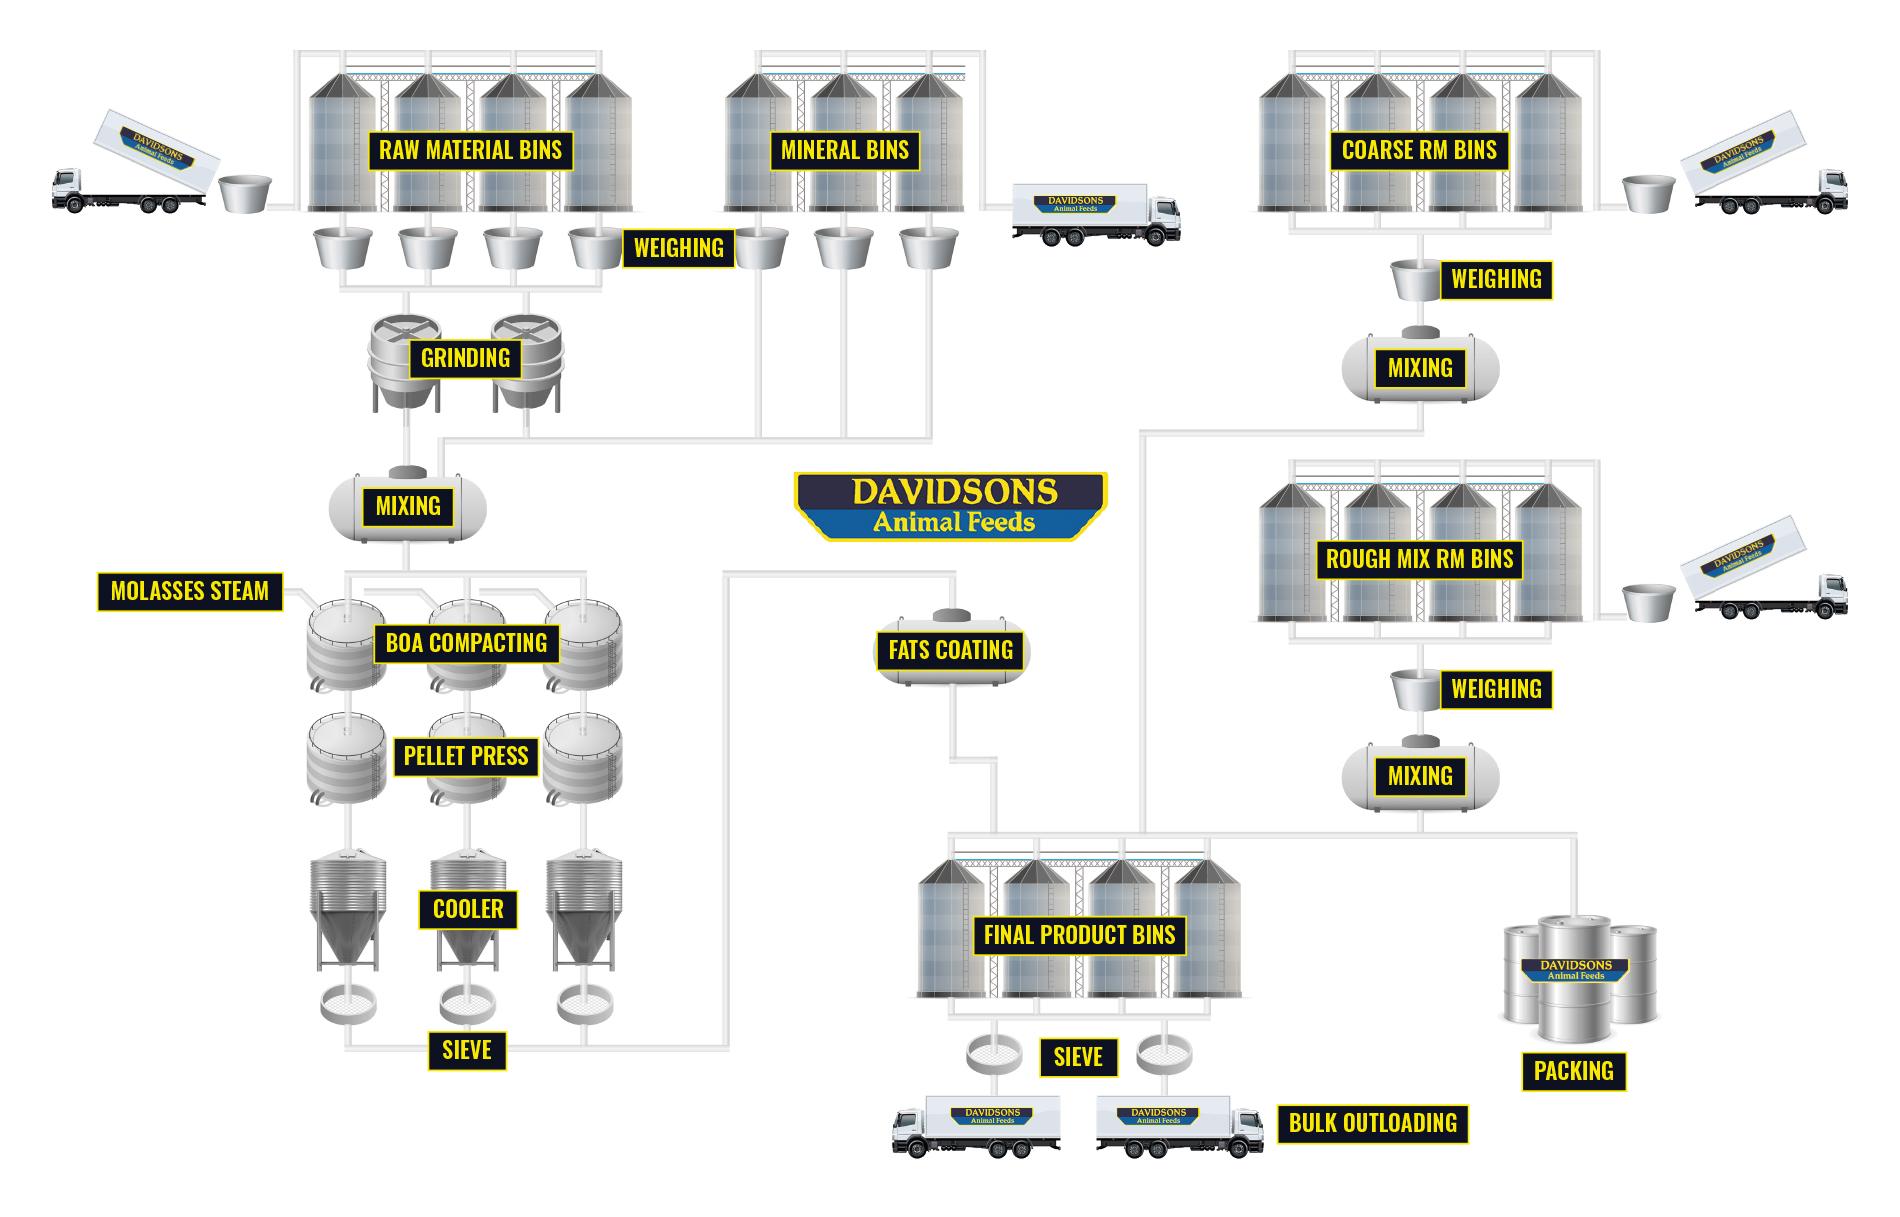 Davidsons Process Infographic